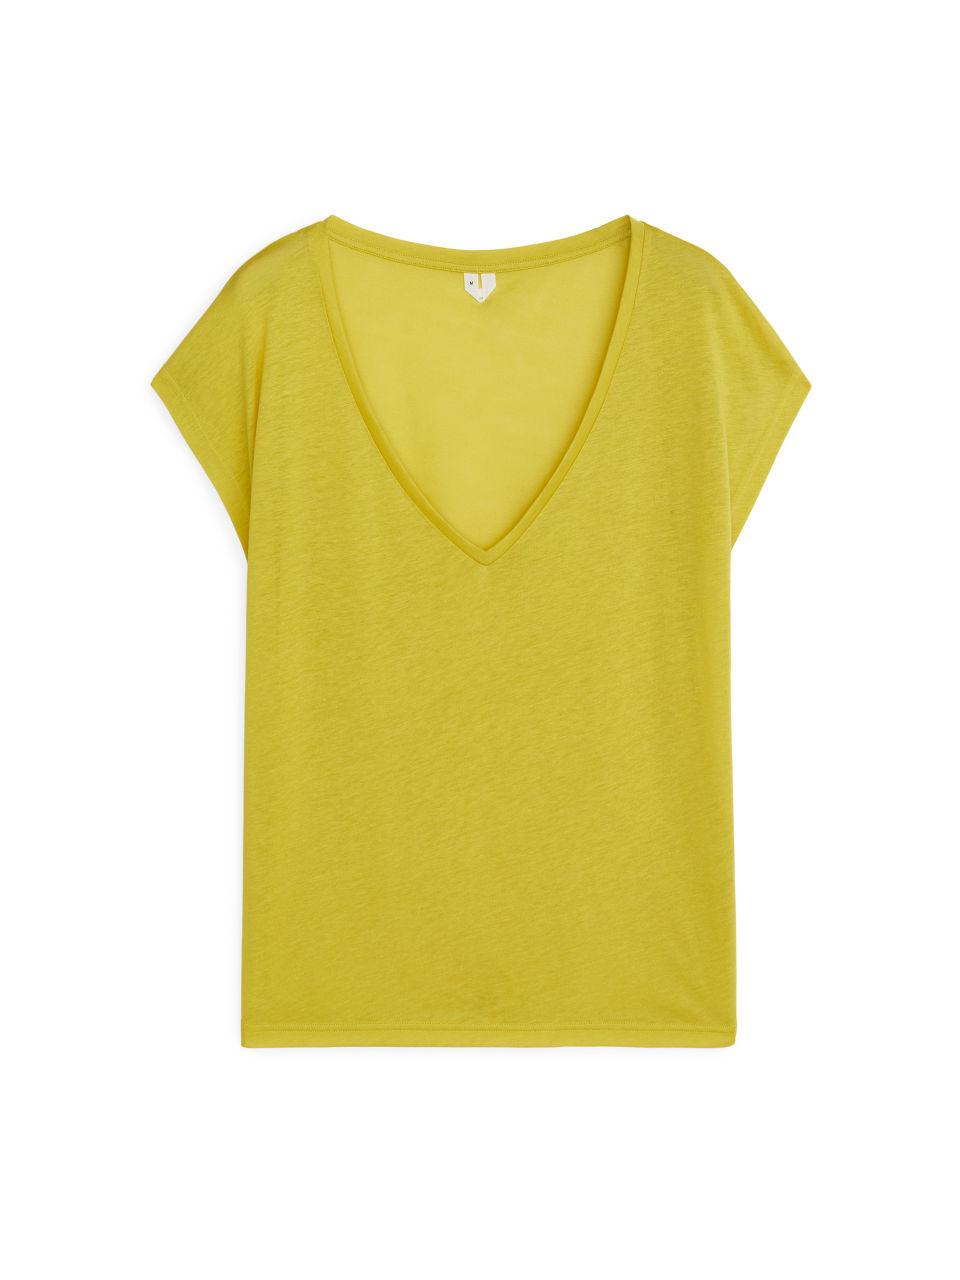 Semi-Sheer T-Shirt - Yellow